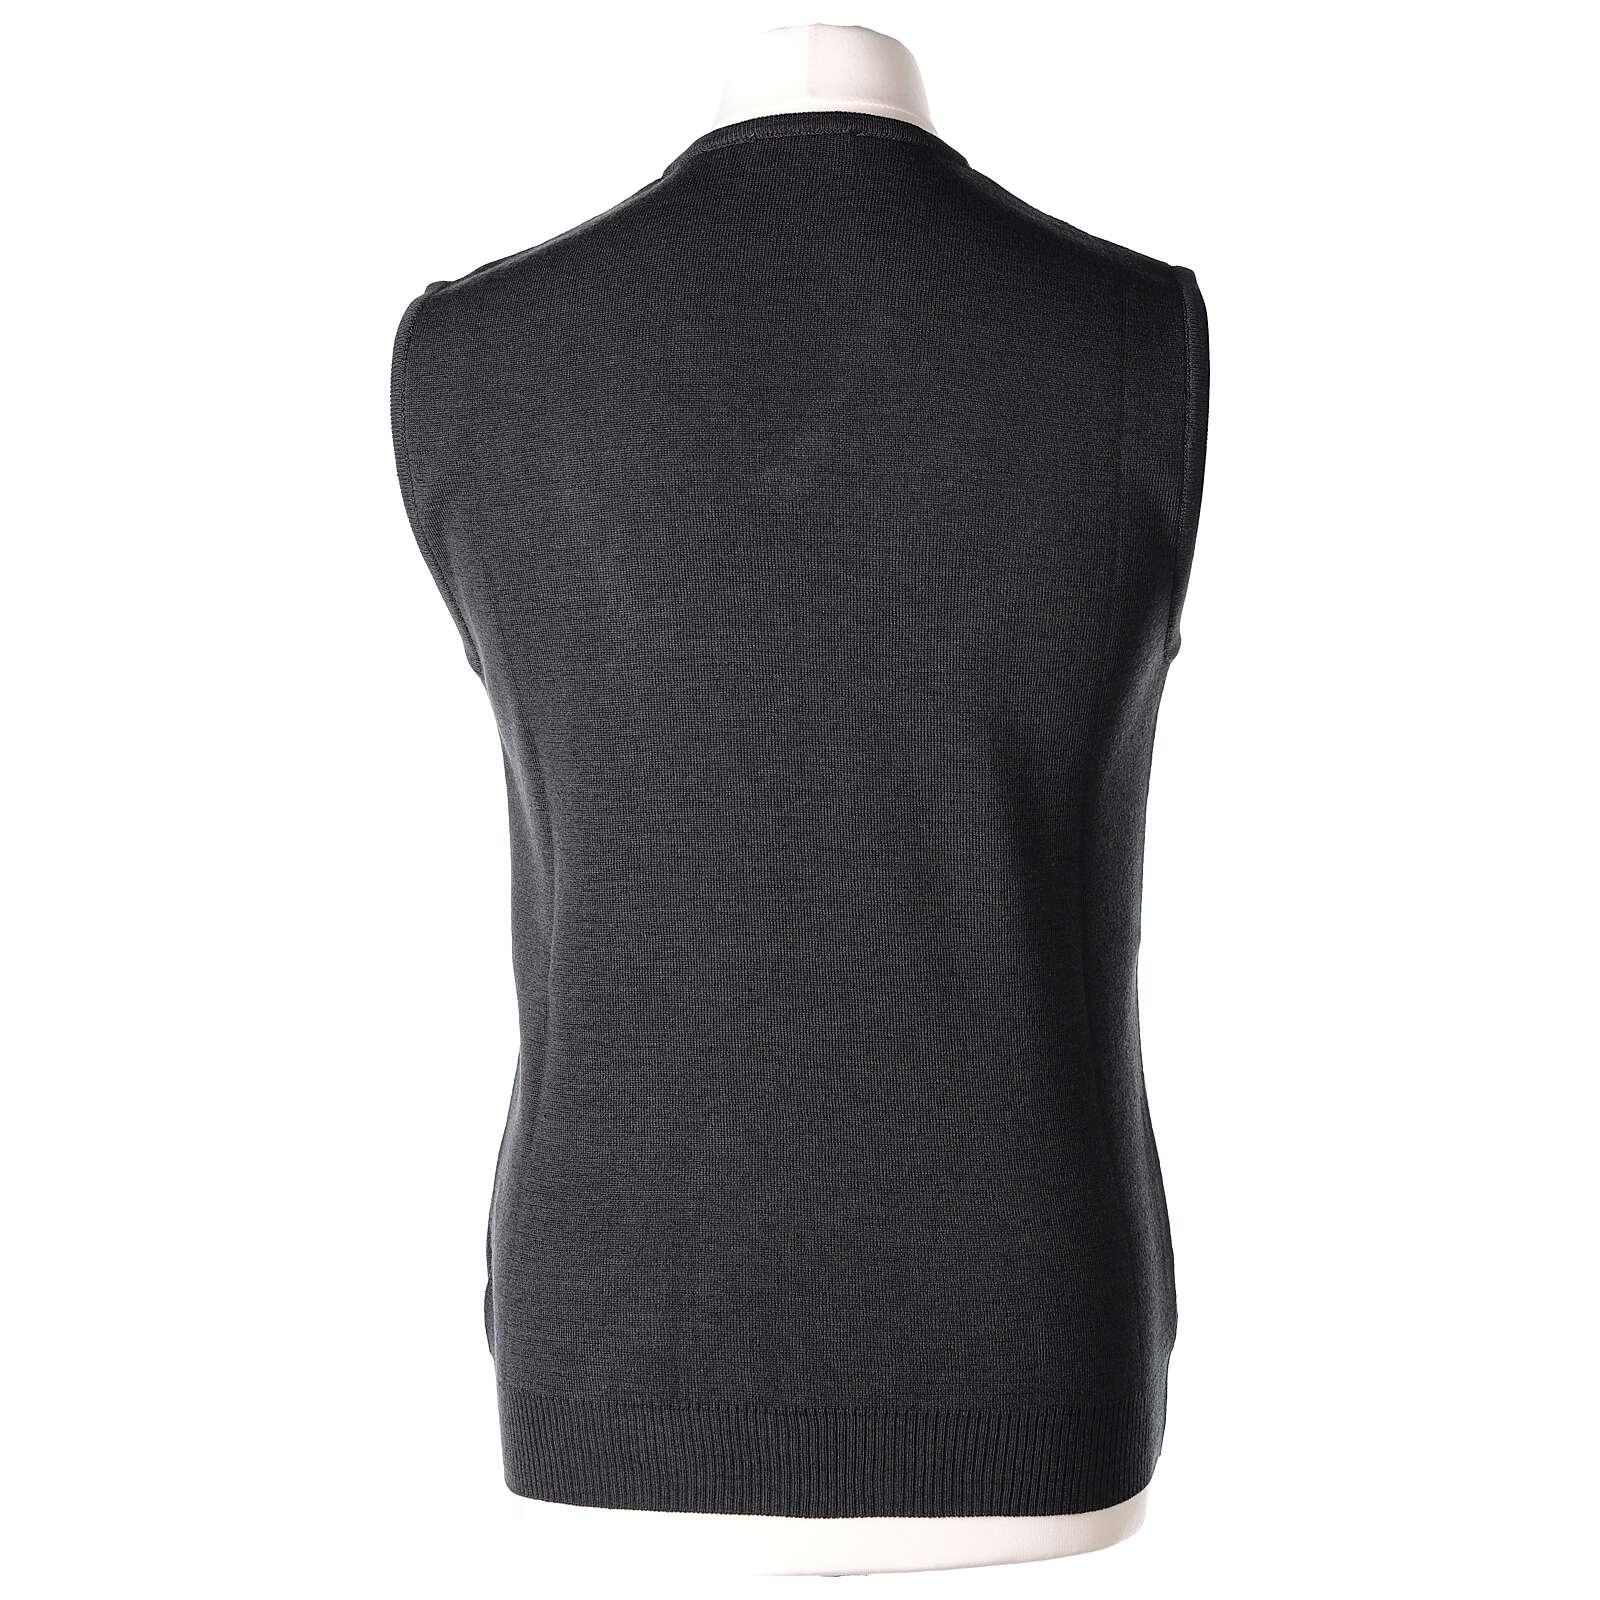 Clergy sleeveless grey jumper plain fabric 50% acrylic 50% merino wool In Primis 4